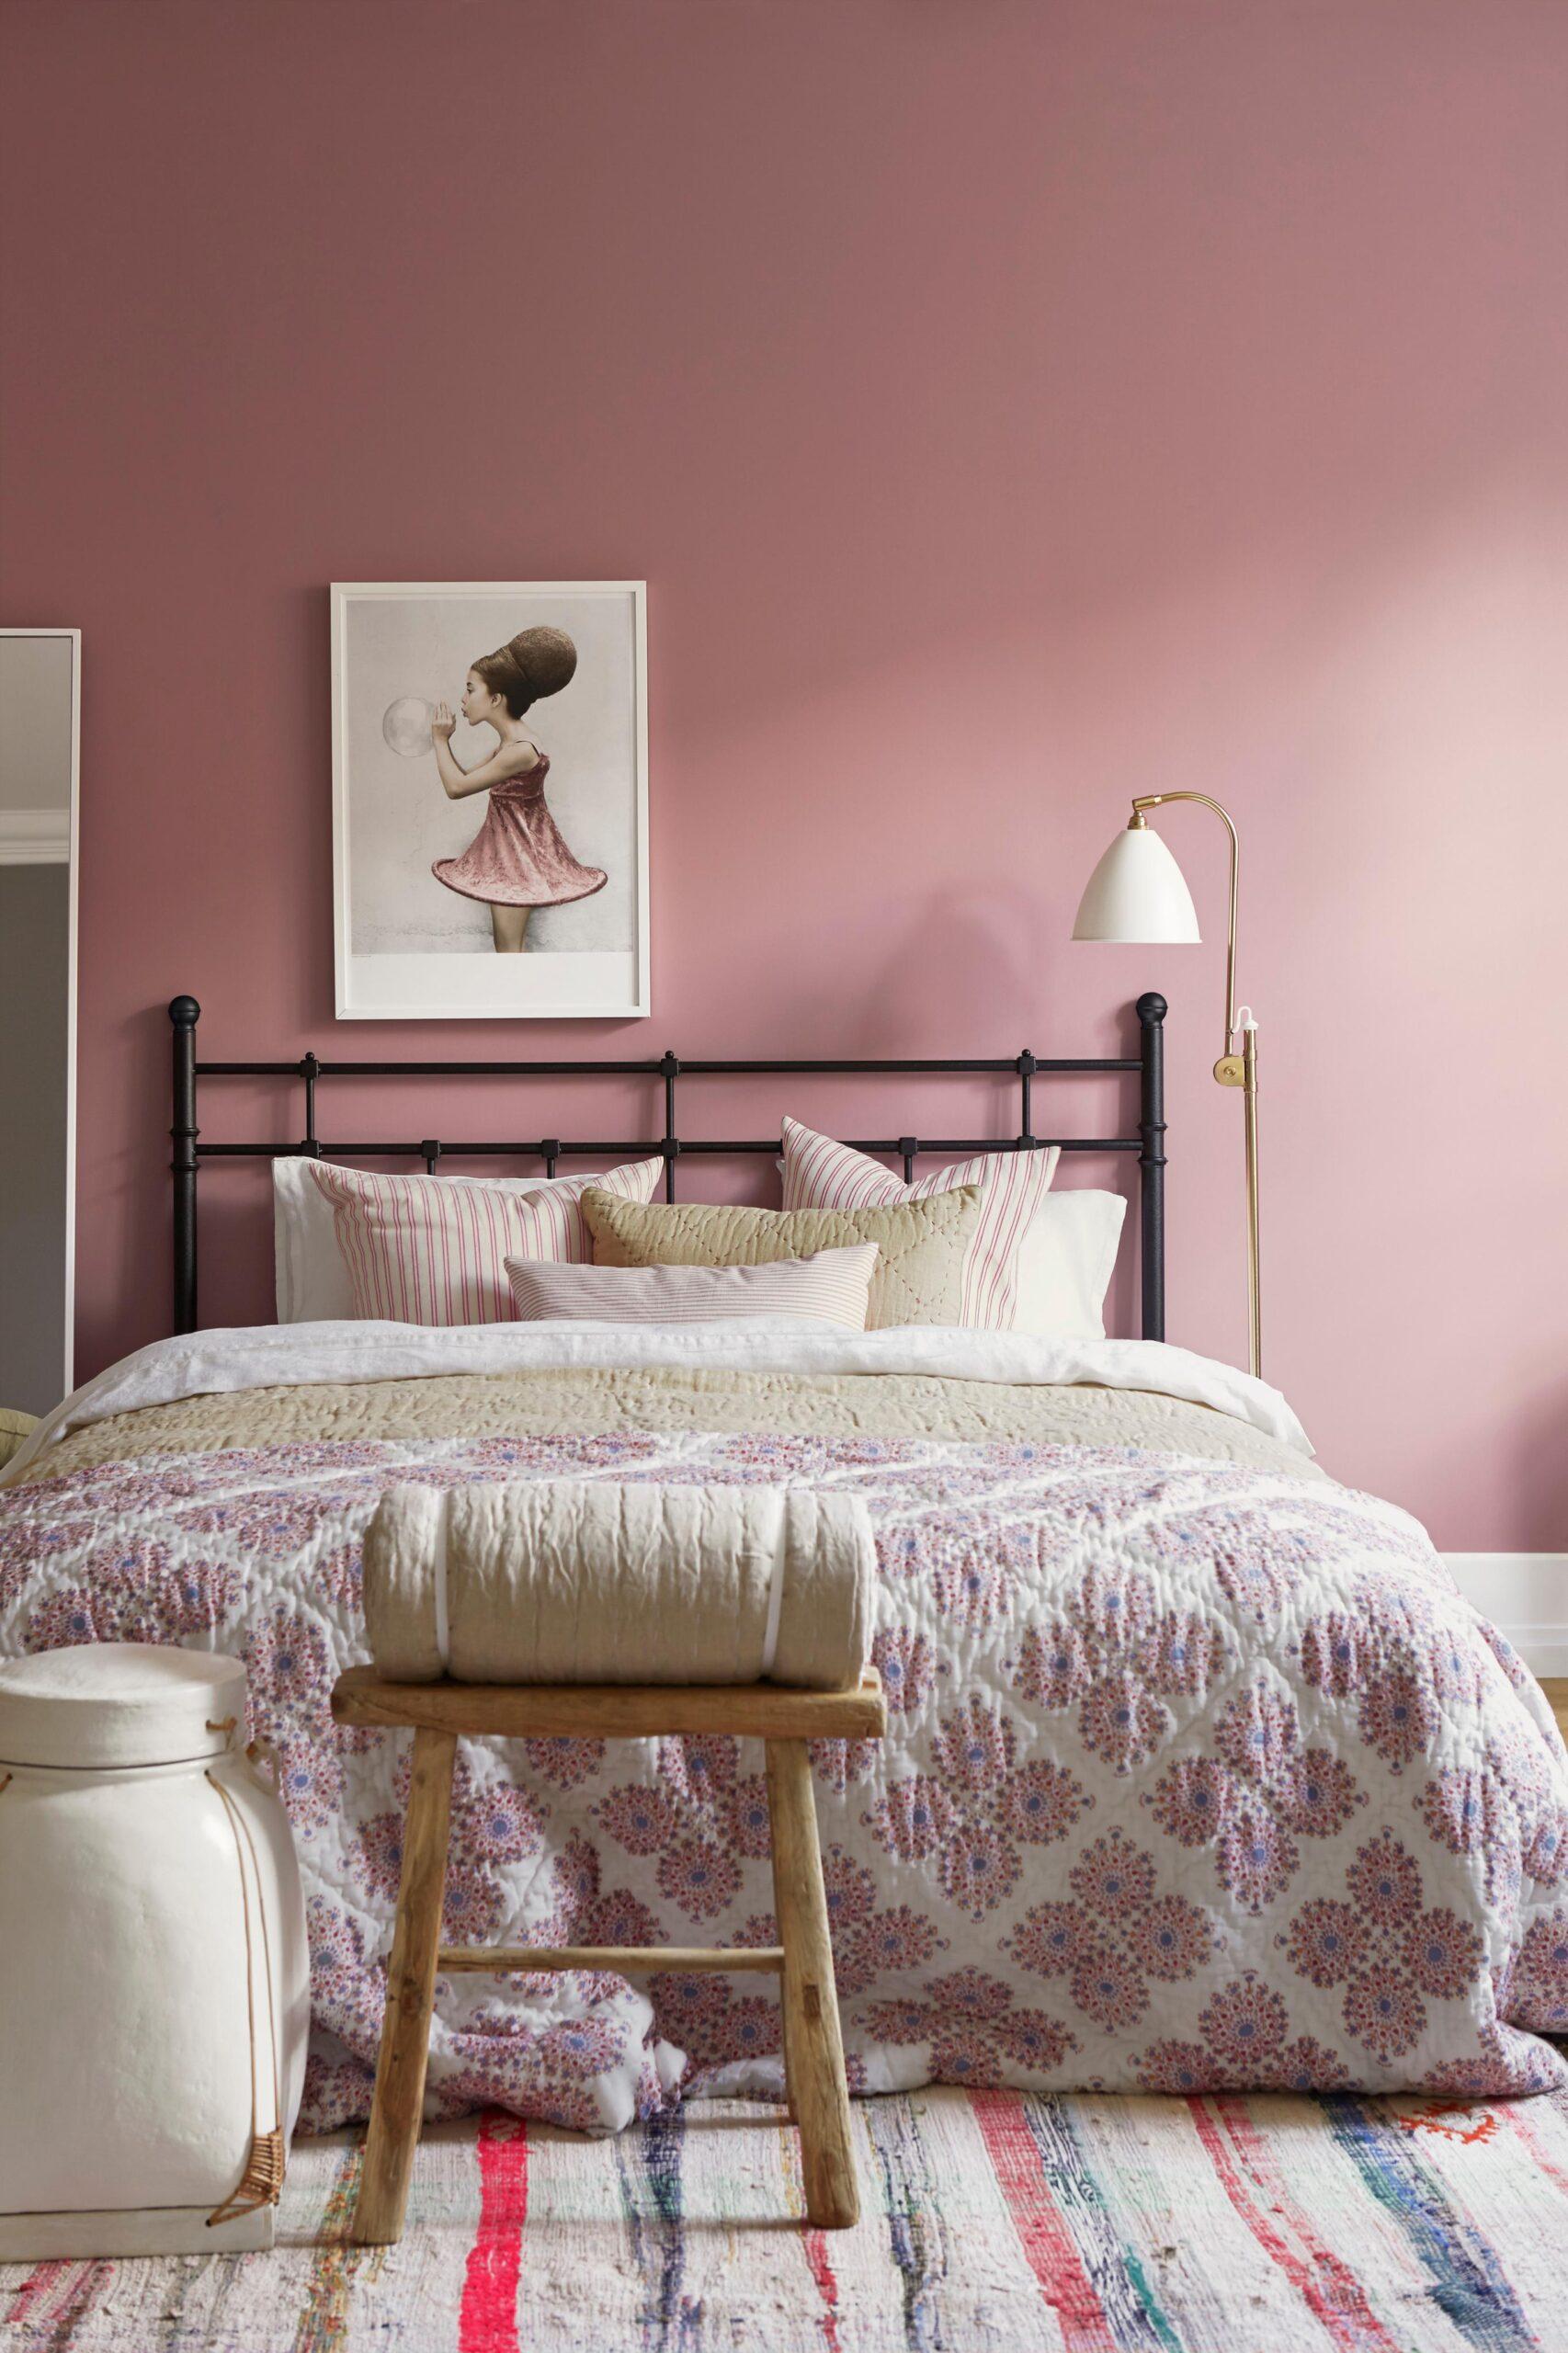 Full Size of Wandfarbe Rosa Bilder Ideen Couch Küche Wohnzimmer Wandfarbe Rosa